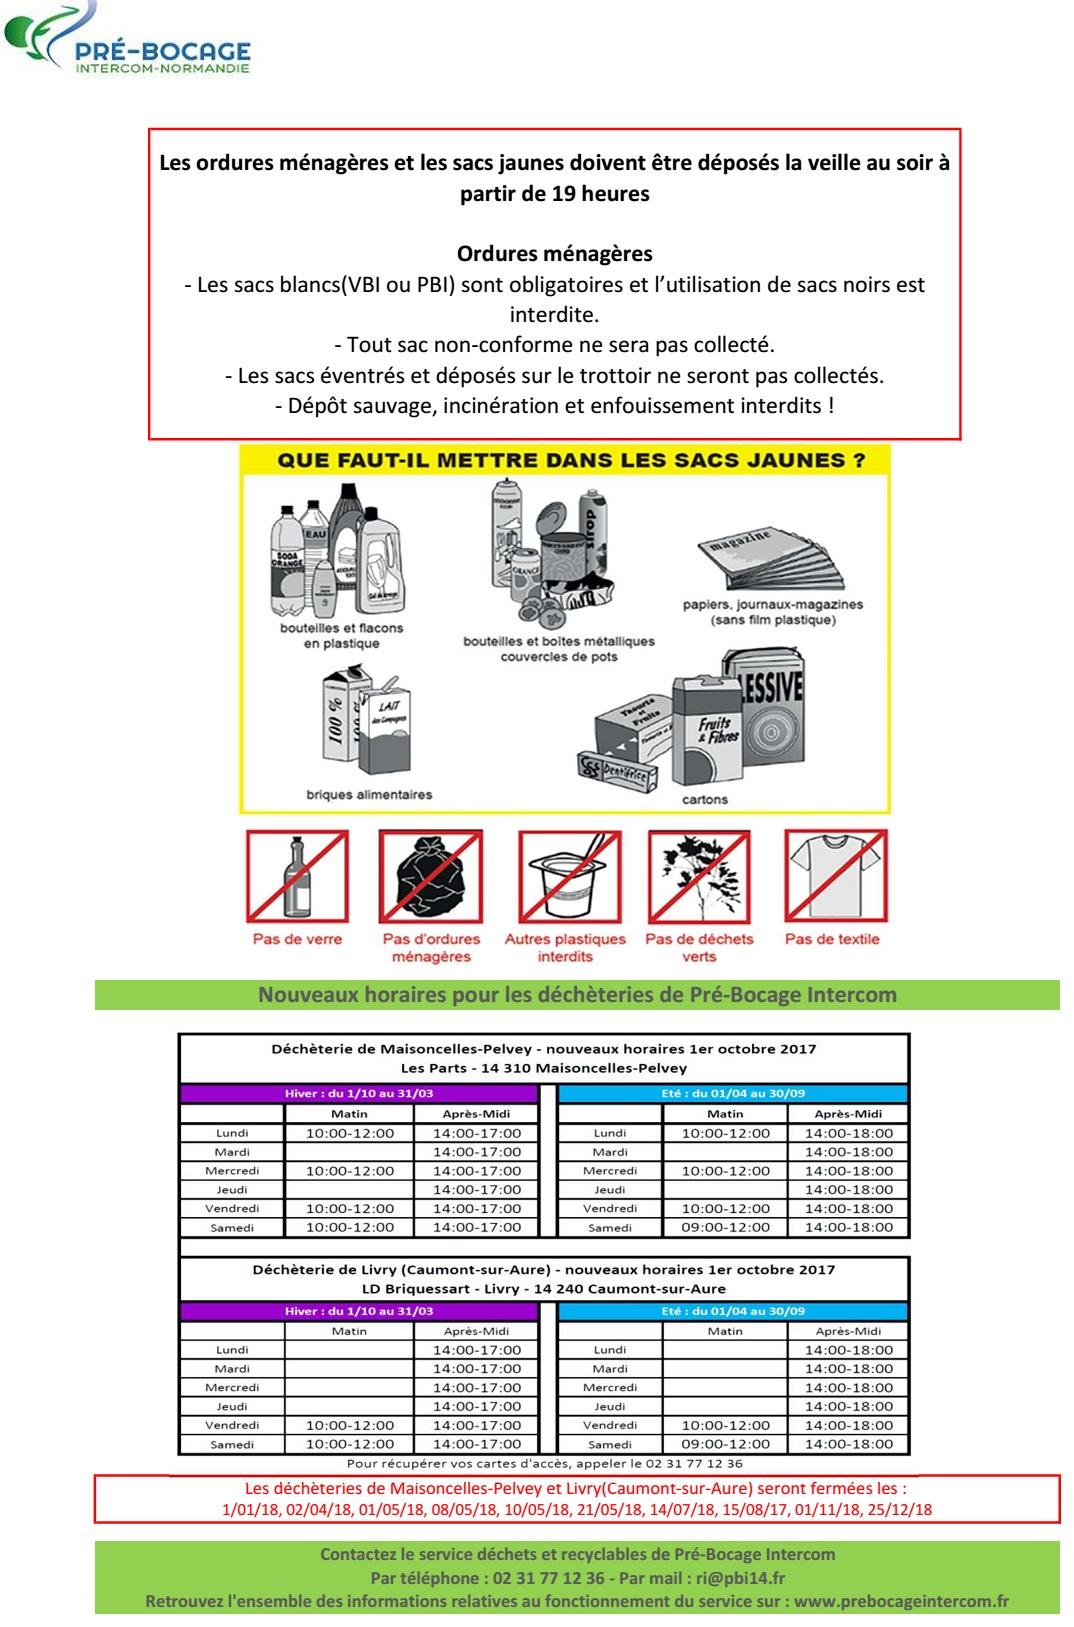 2018 regles collectes et horaires decheteries